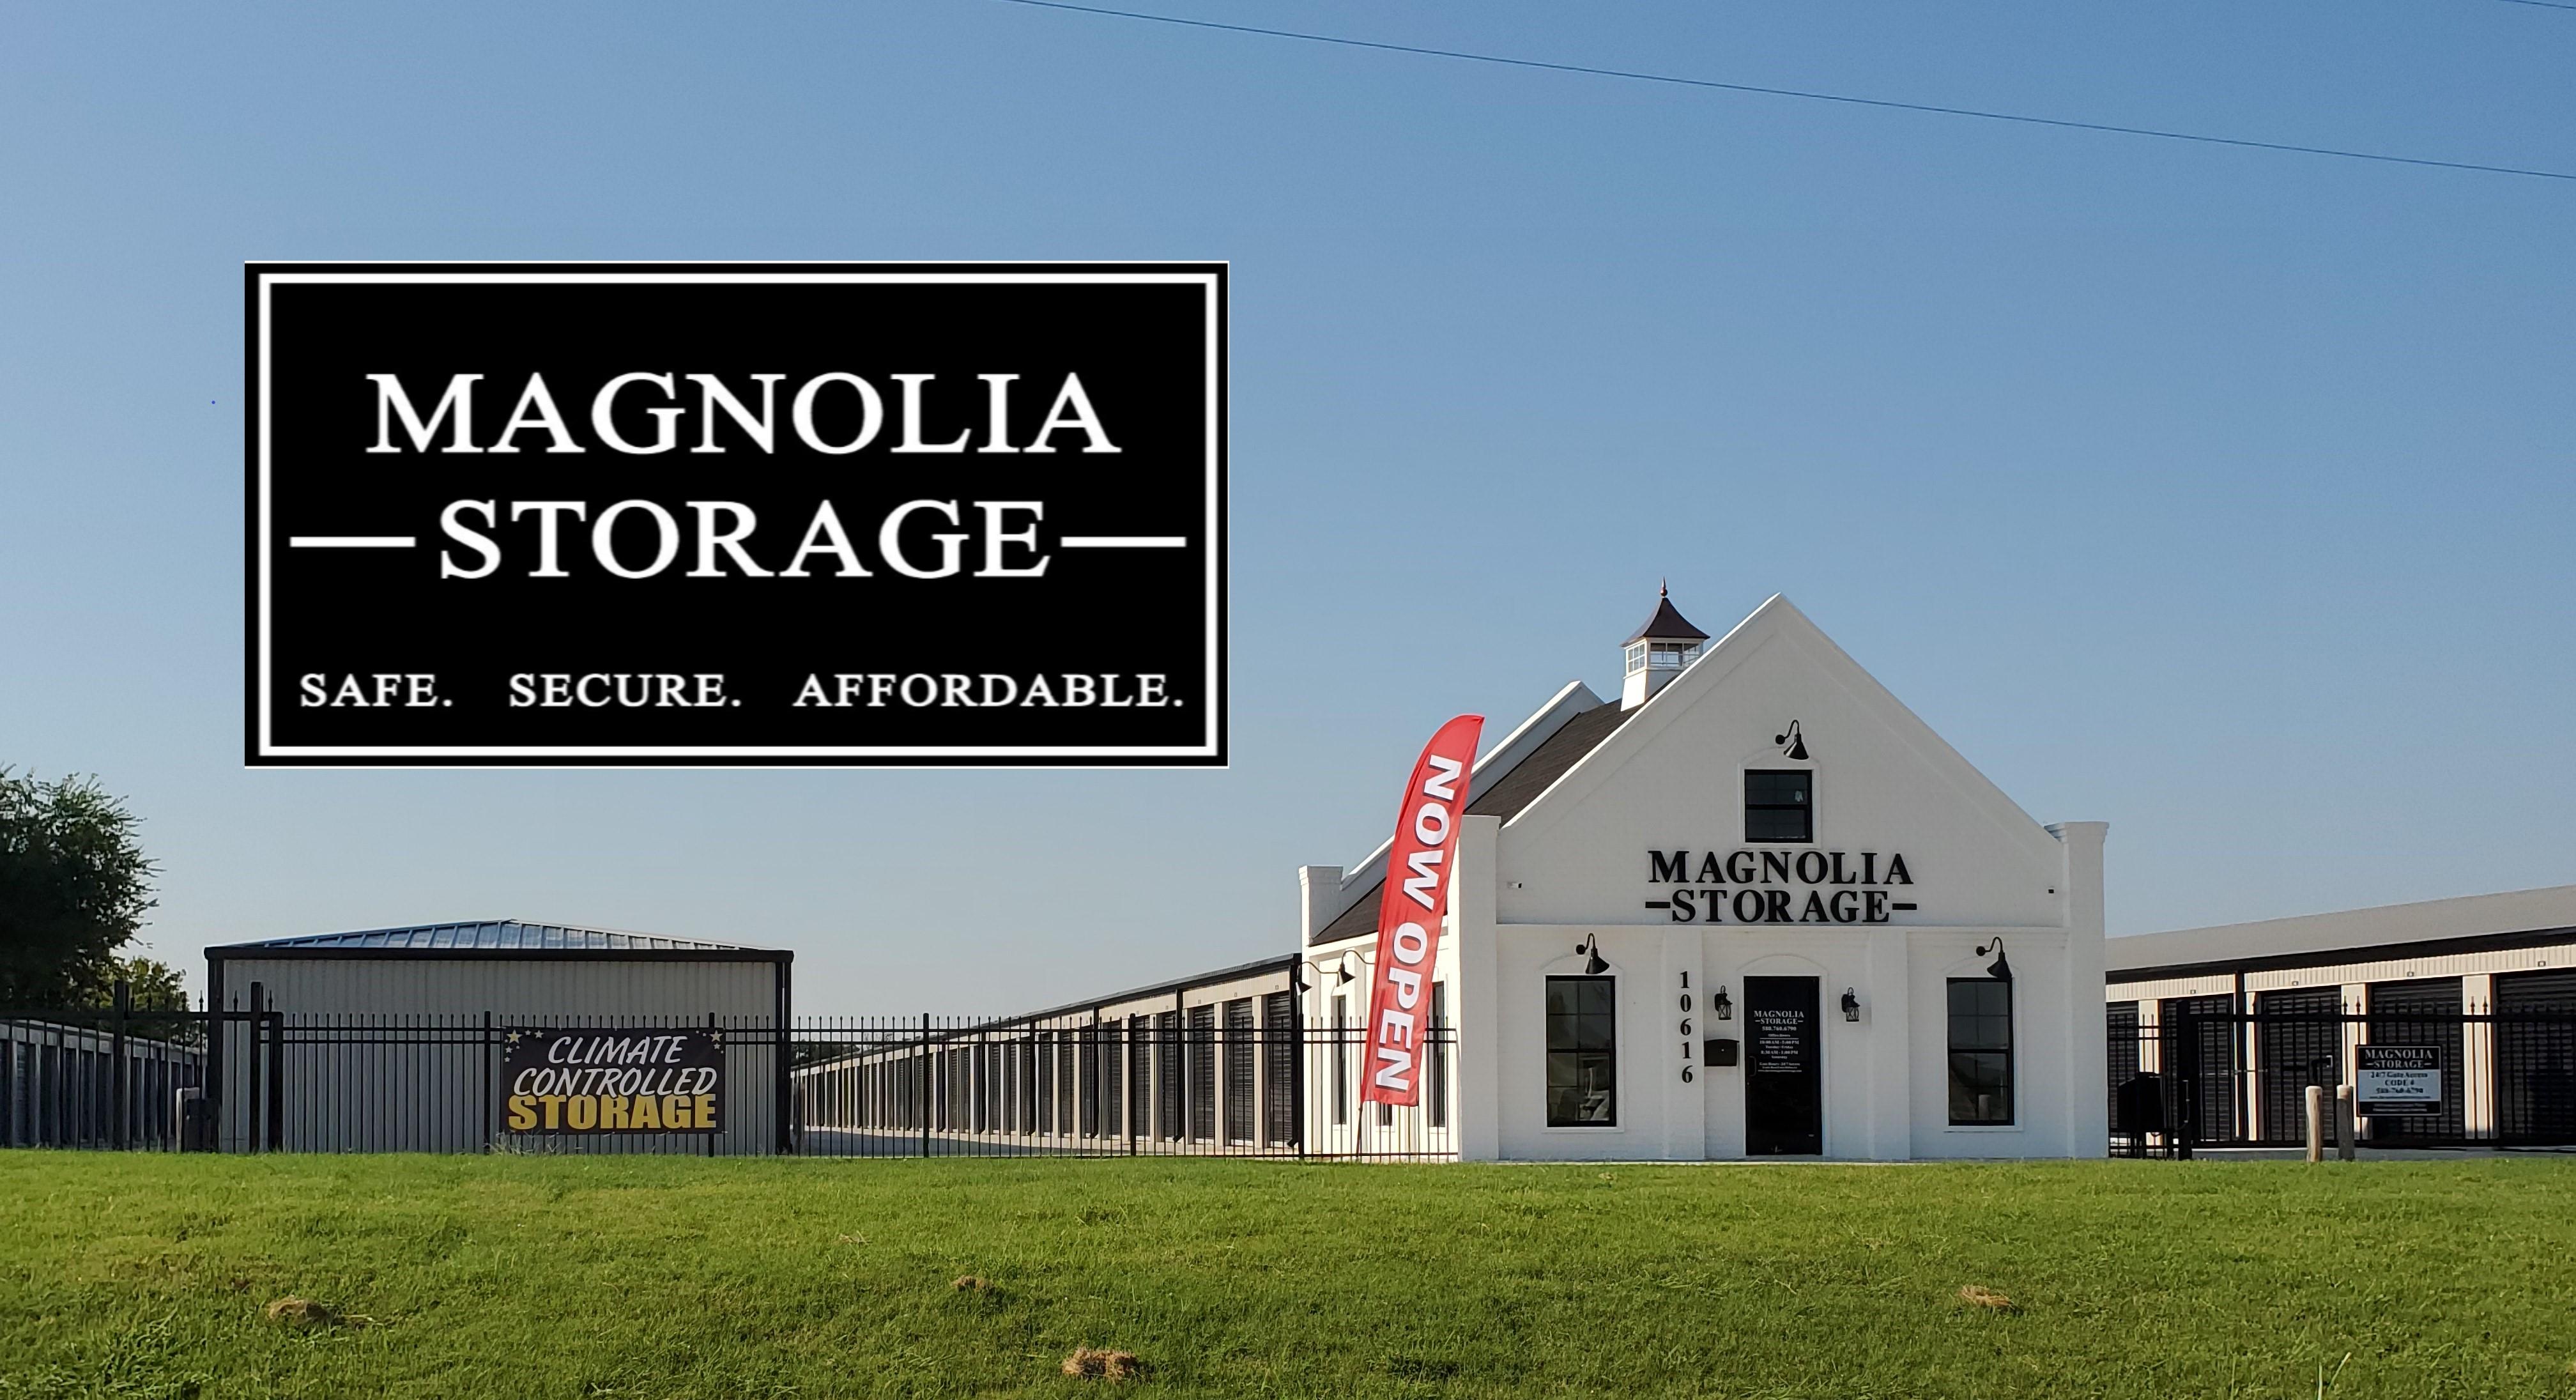 Magnolia Storage